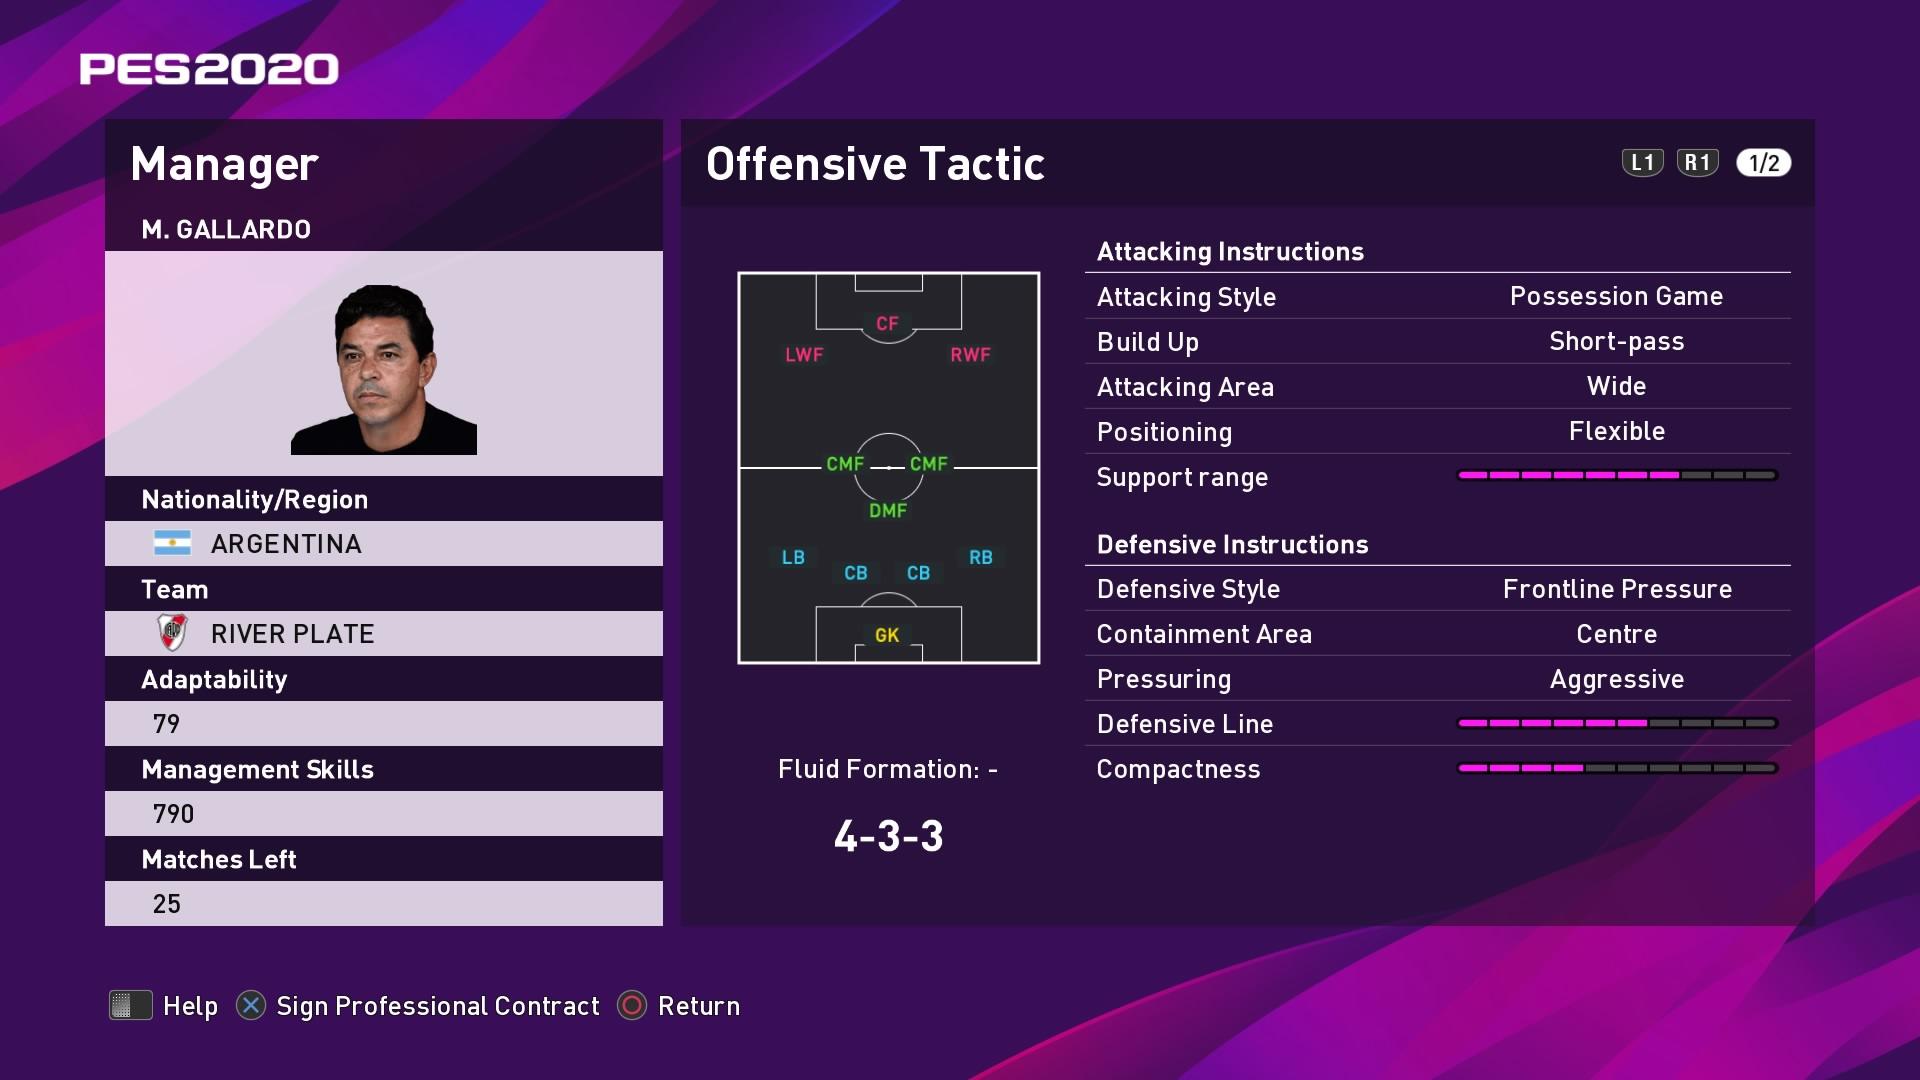 M. Gallardo (Marcelo Gallardo) Offensive Tactic in PES 2020 myClub